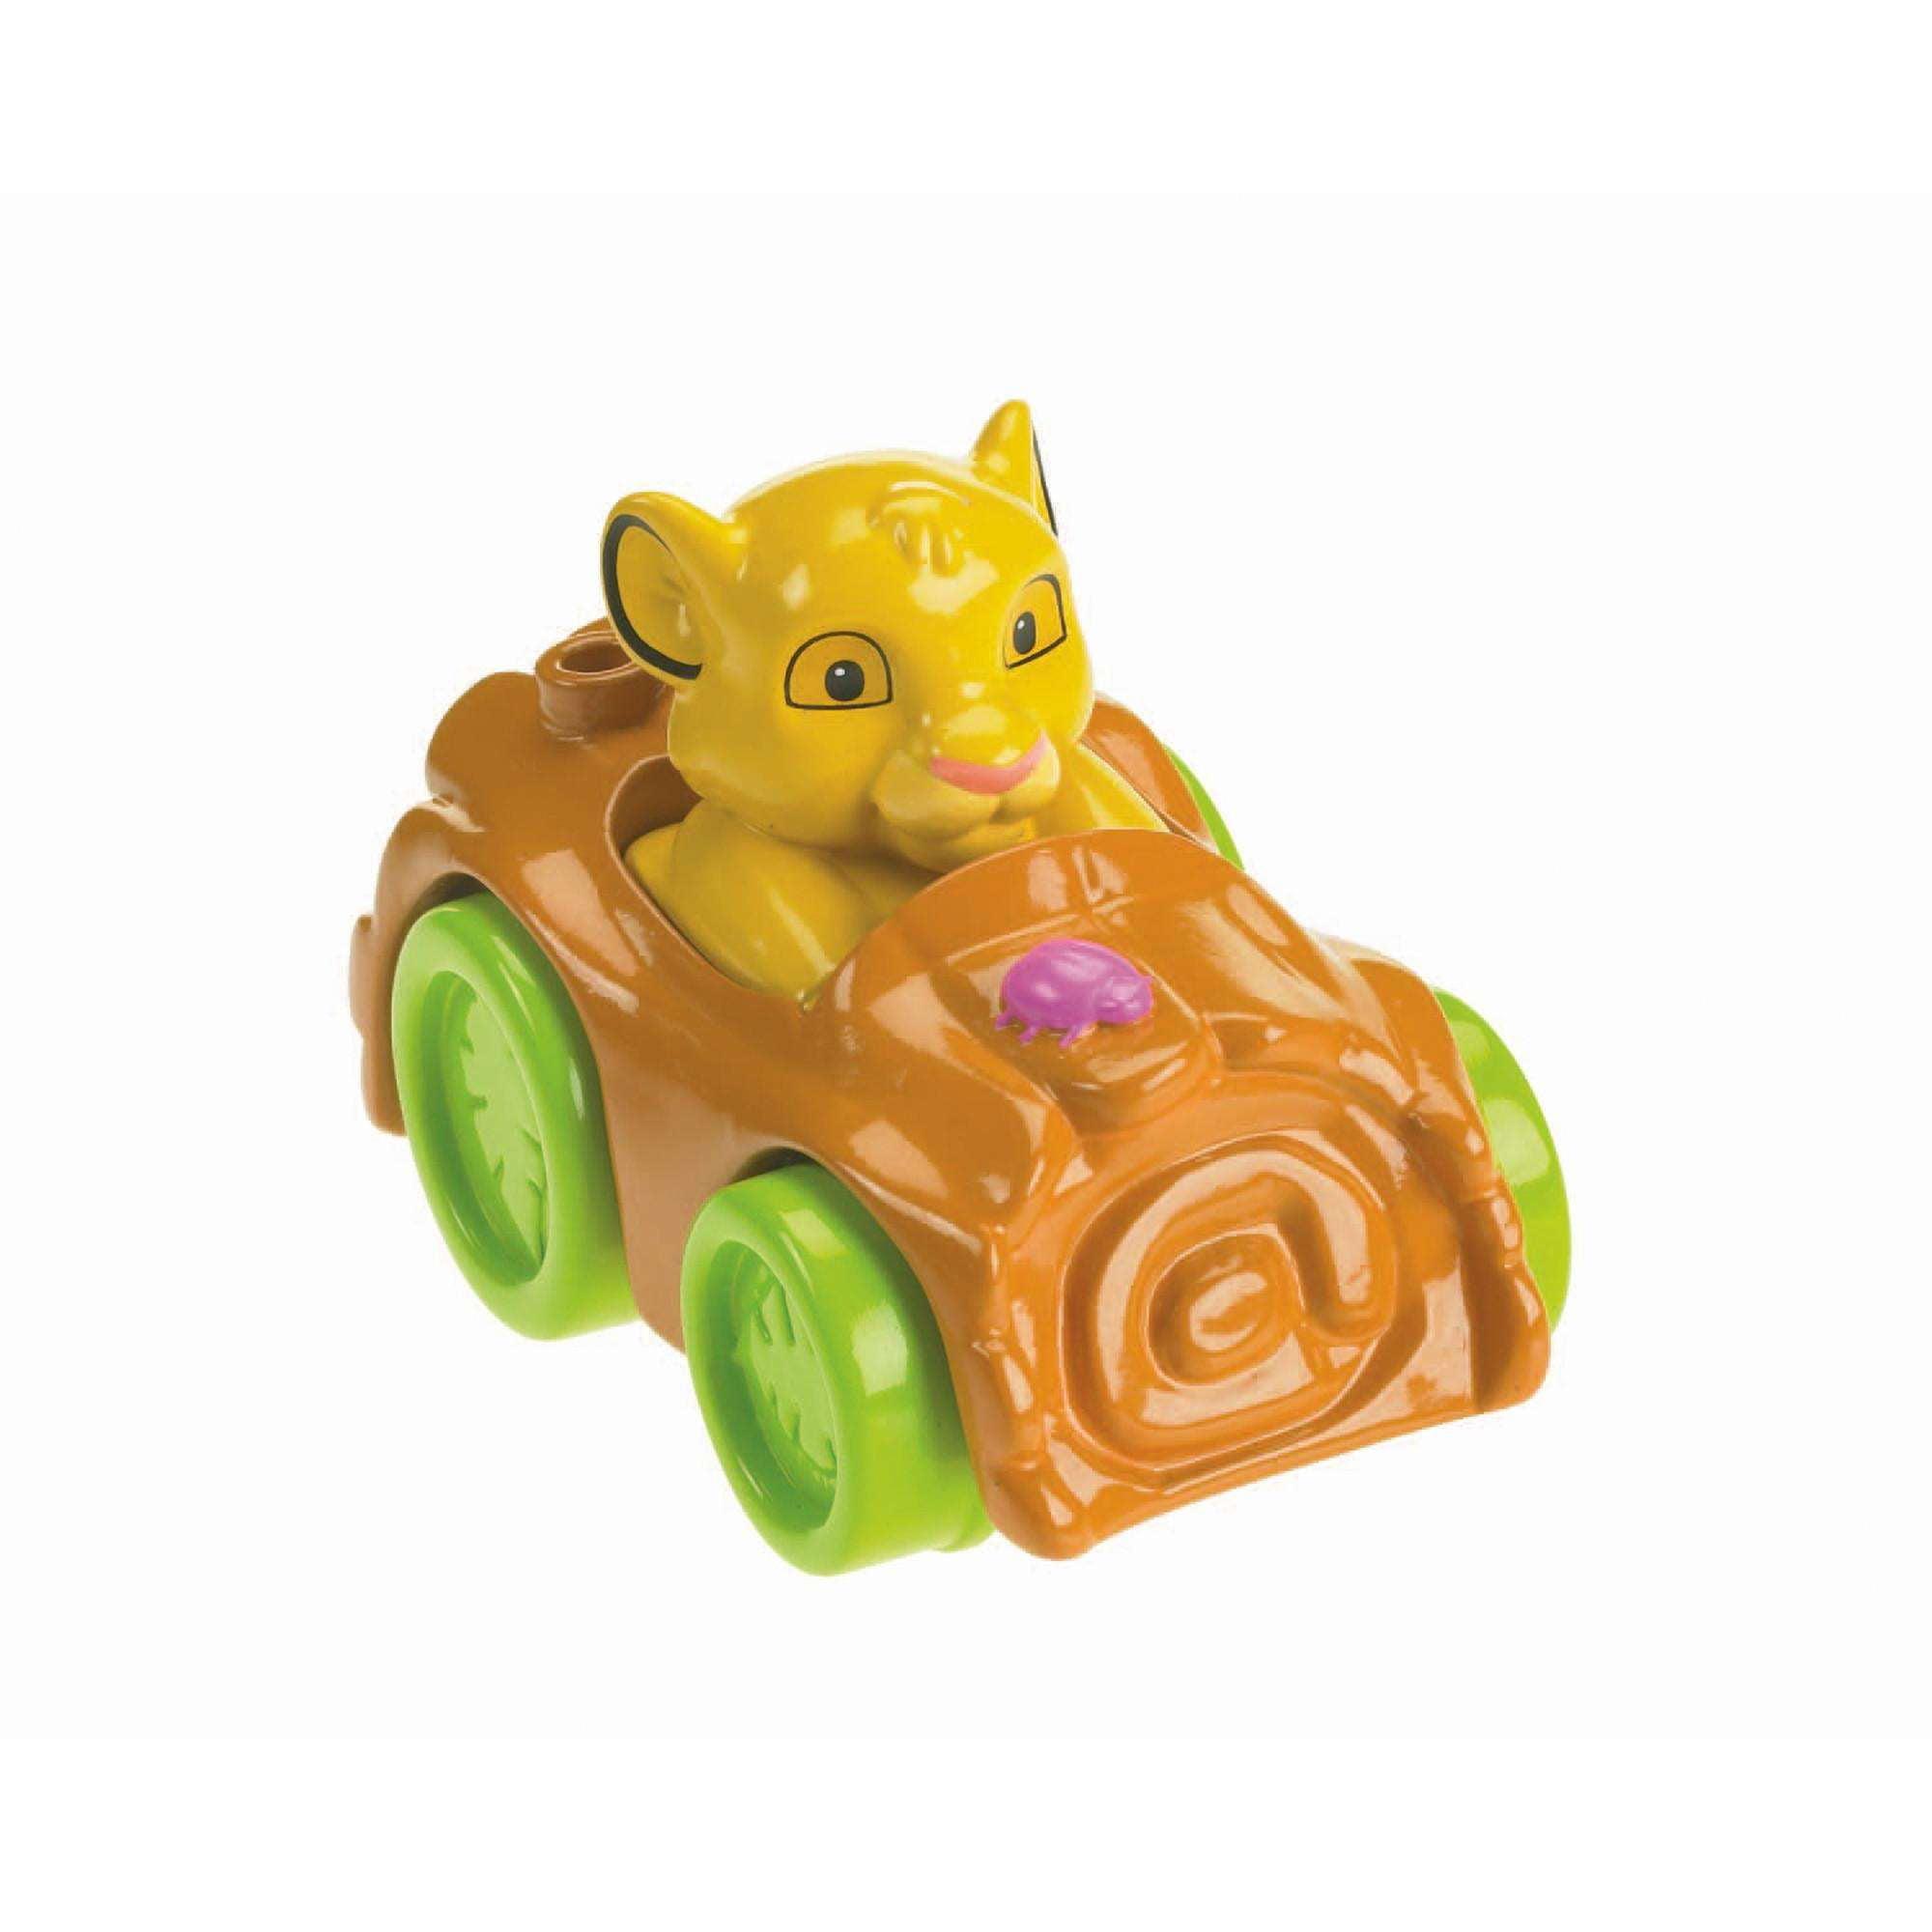 Little People Disney Wheelies Simba